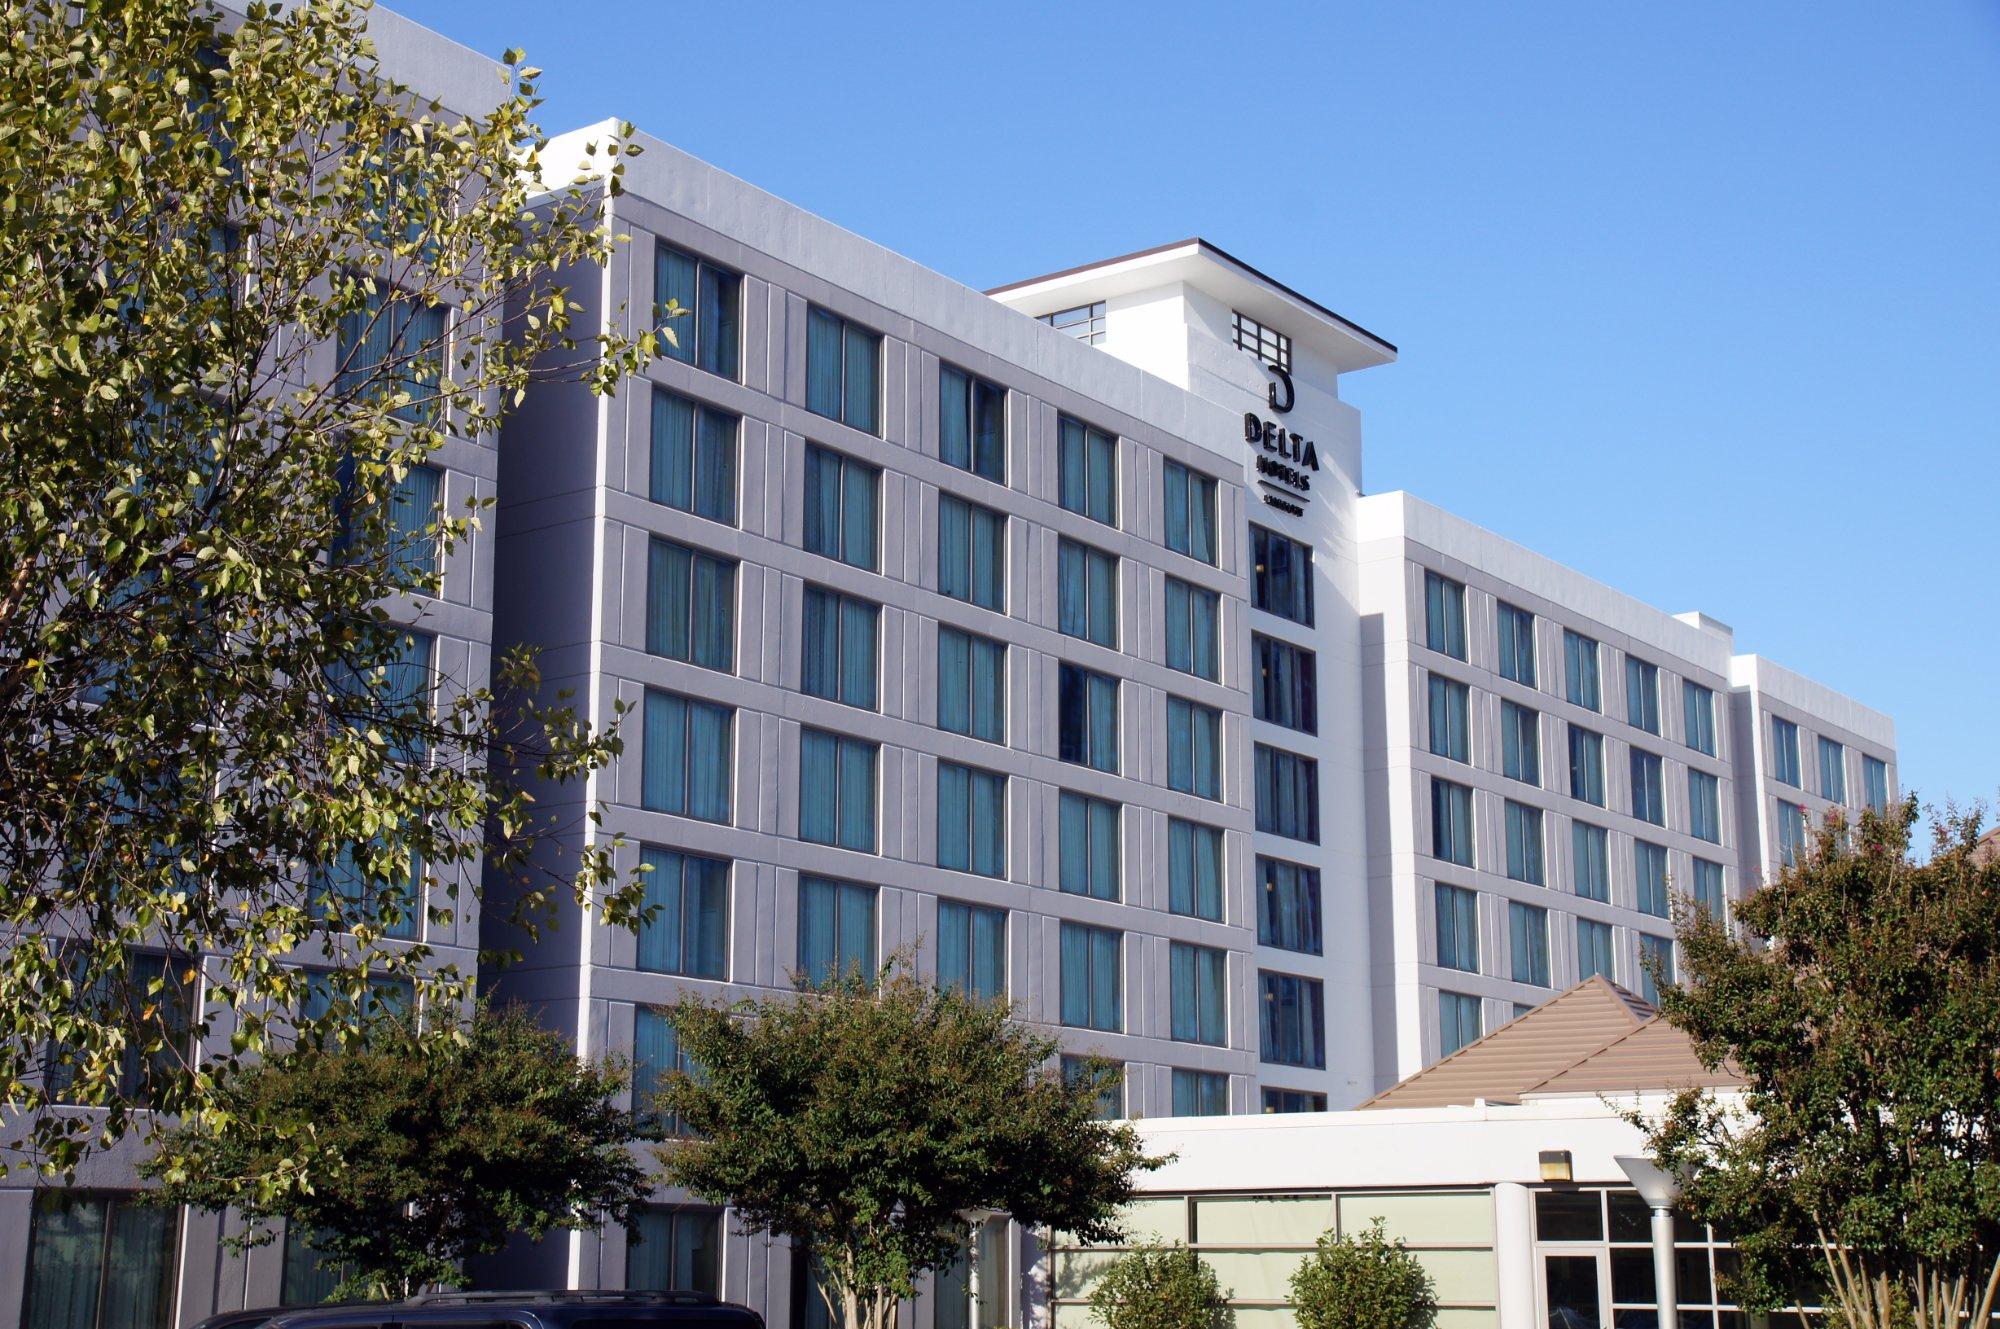 Delta Hotels by Marriott Chesapeake VA Review Family